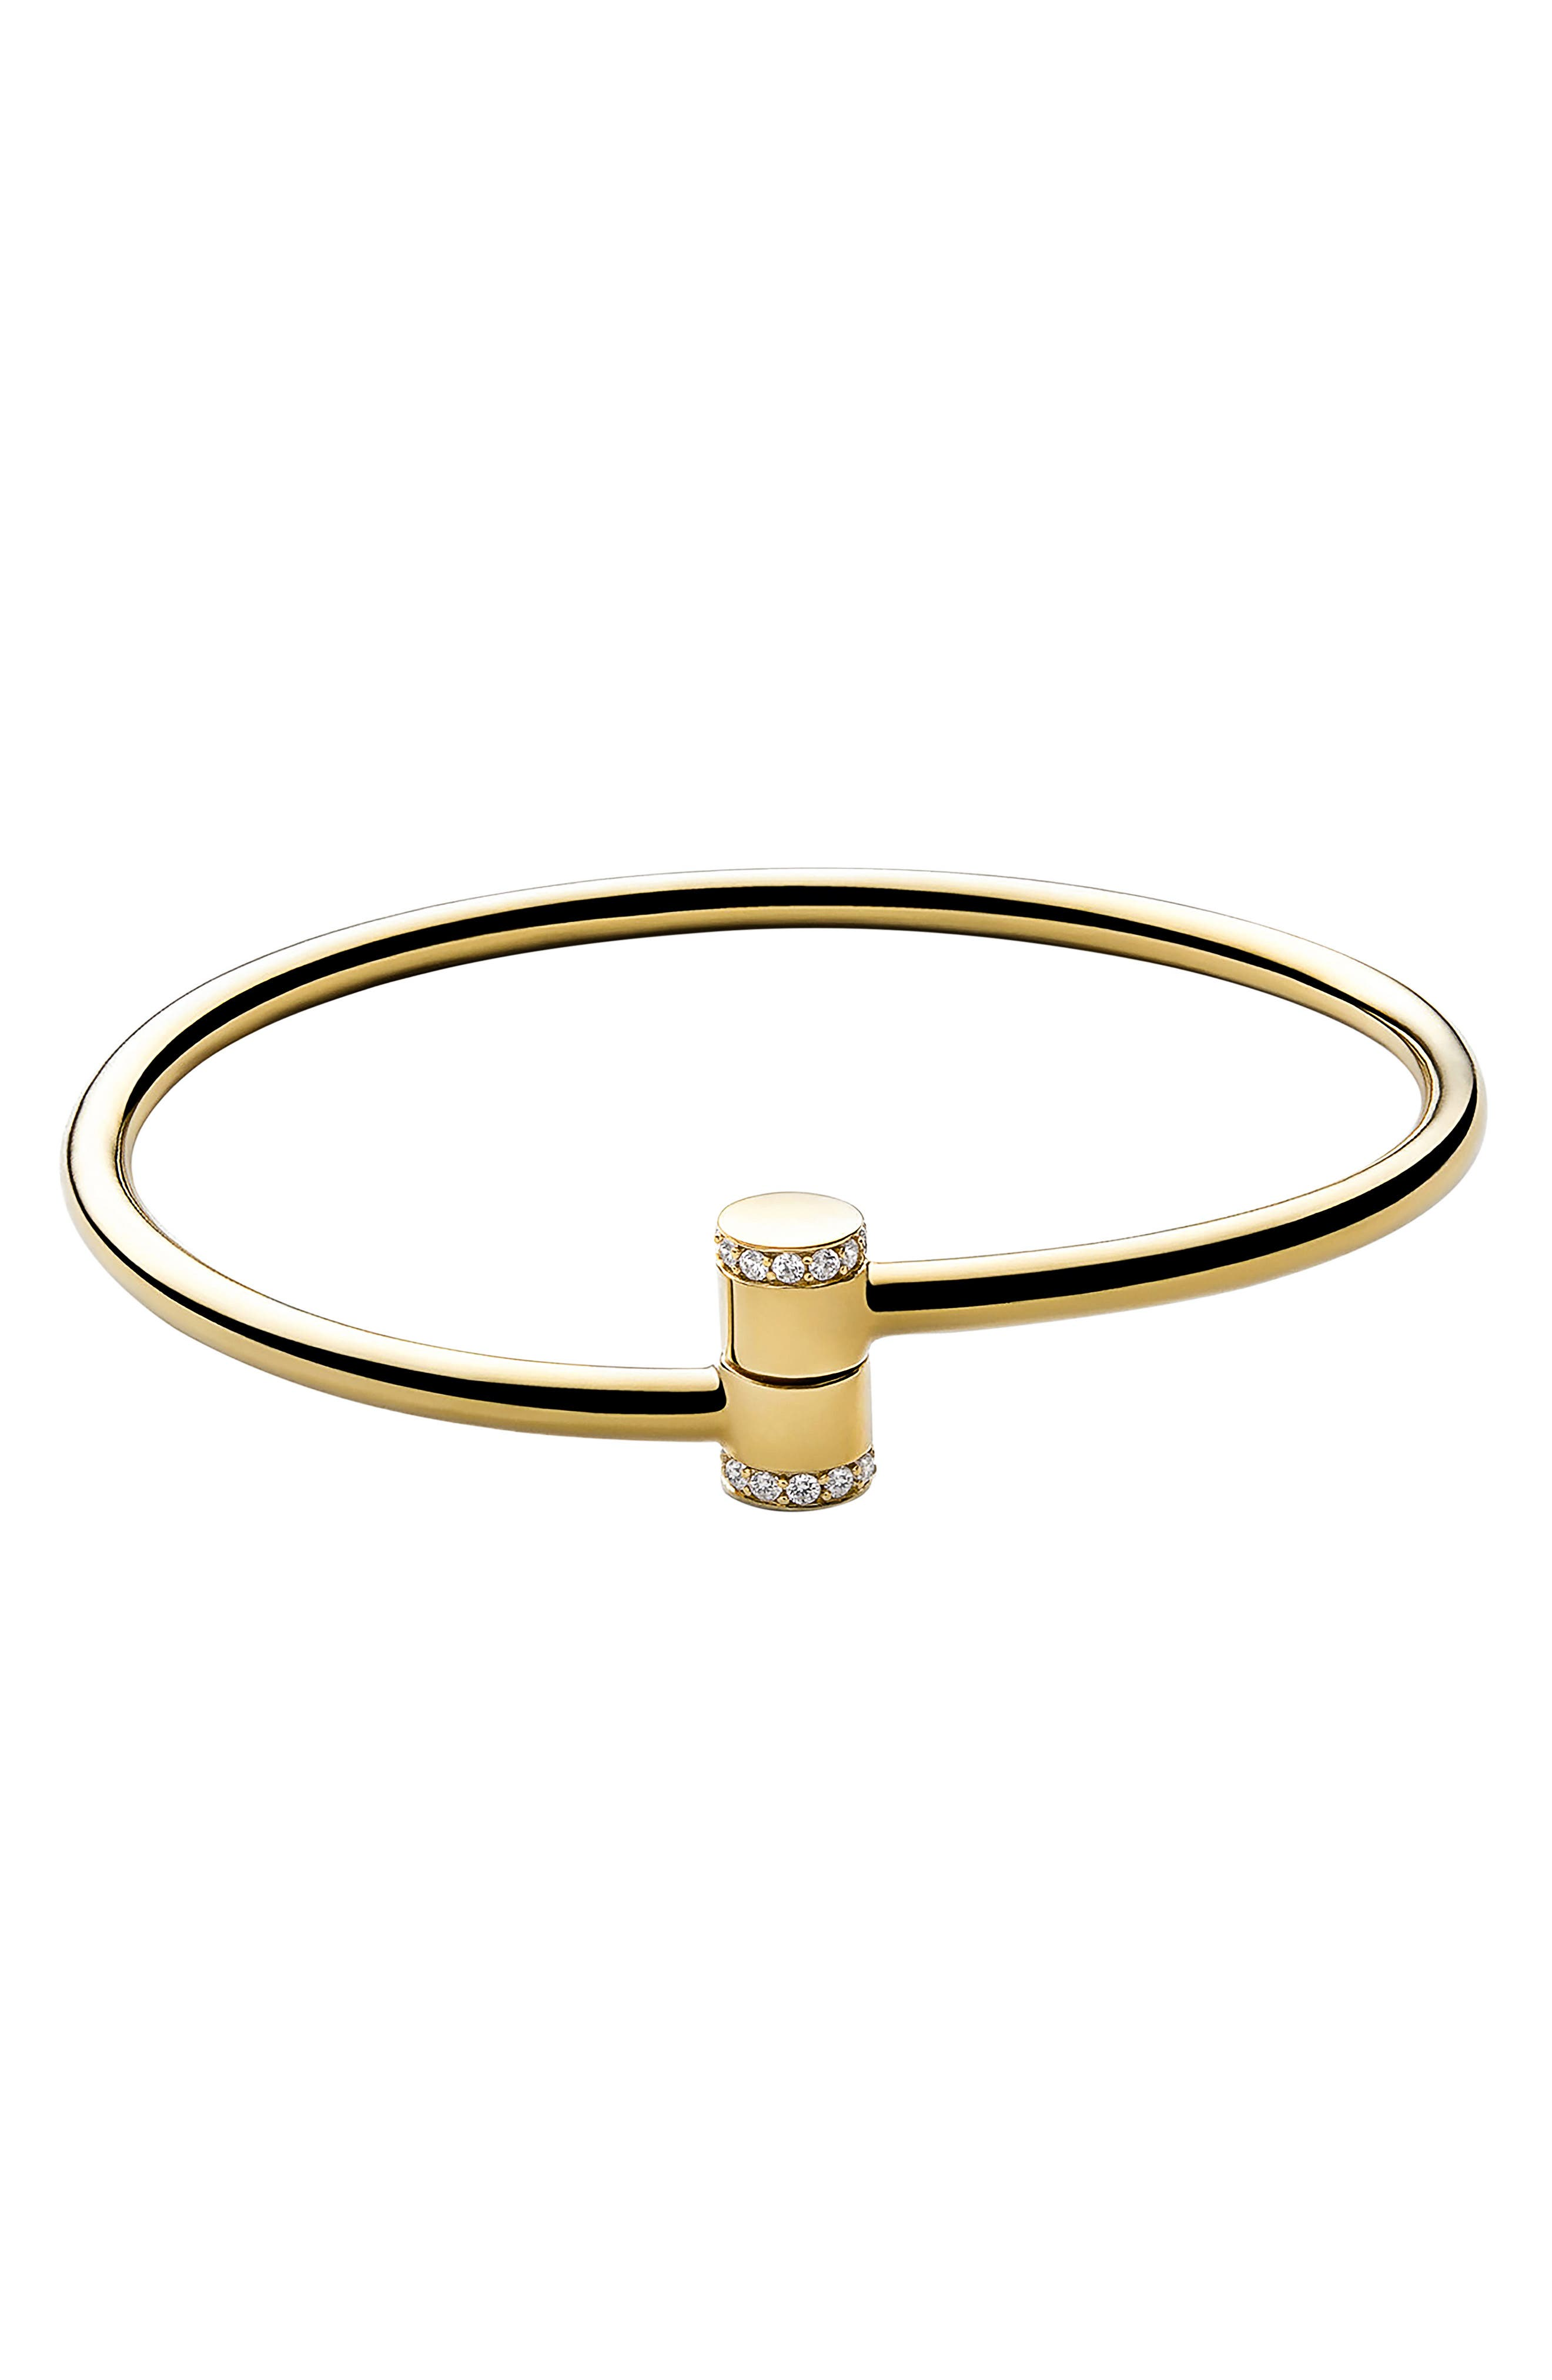 White Sapphire Pillar Cuff Bracelet,                             Main thumbnail 1, color,                             POLISHED GOLD/ WHITE SAPPHIRE